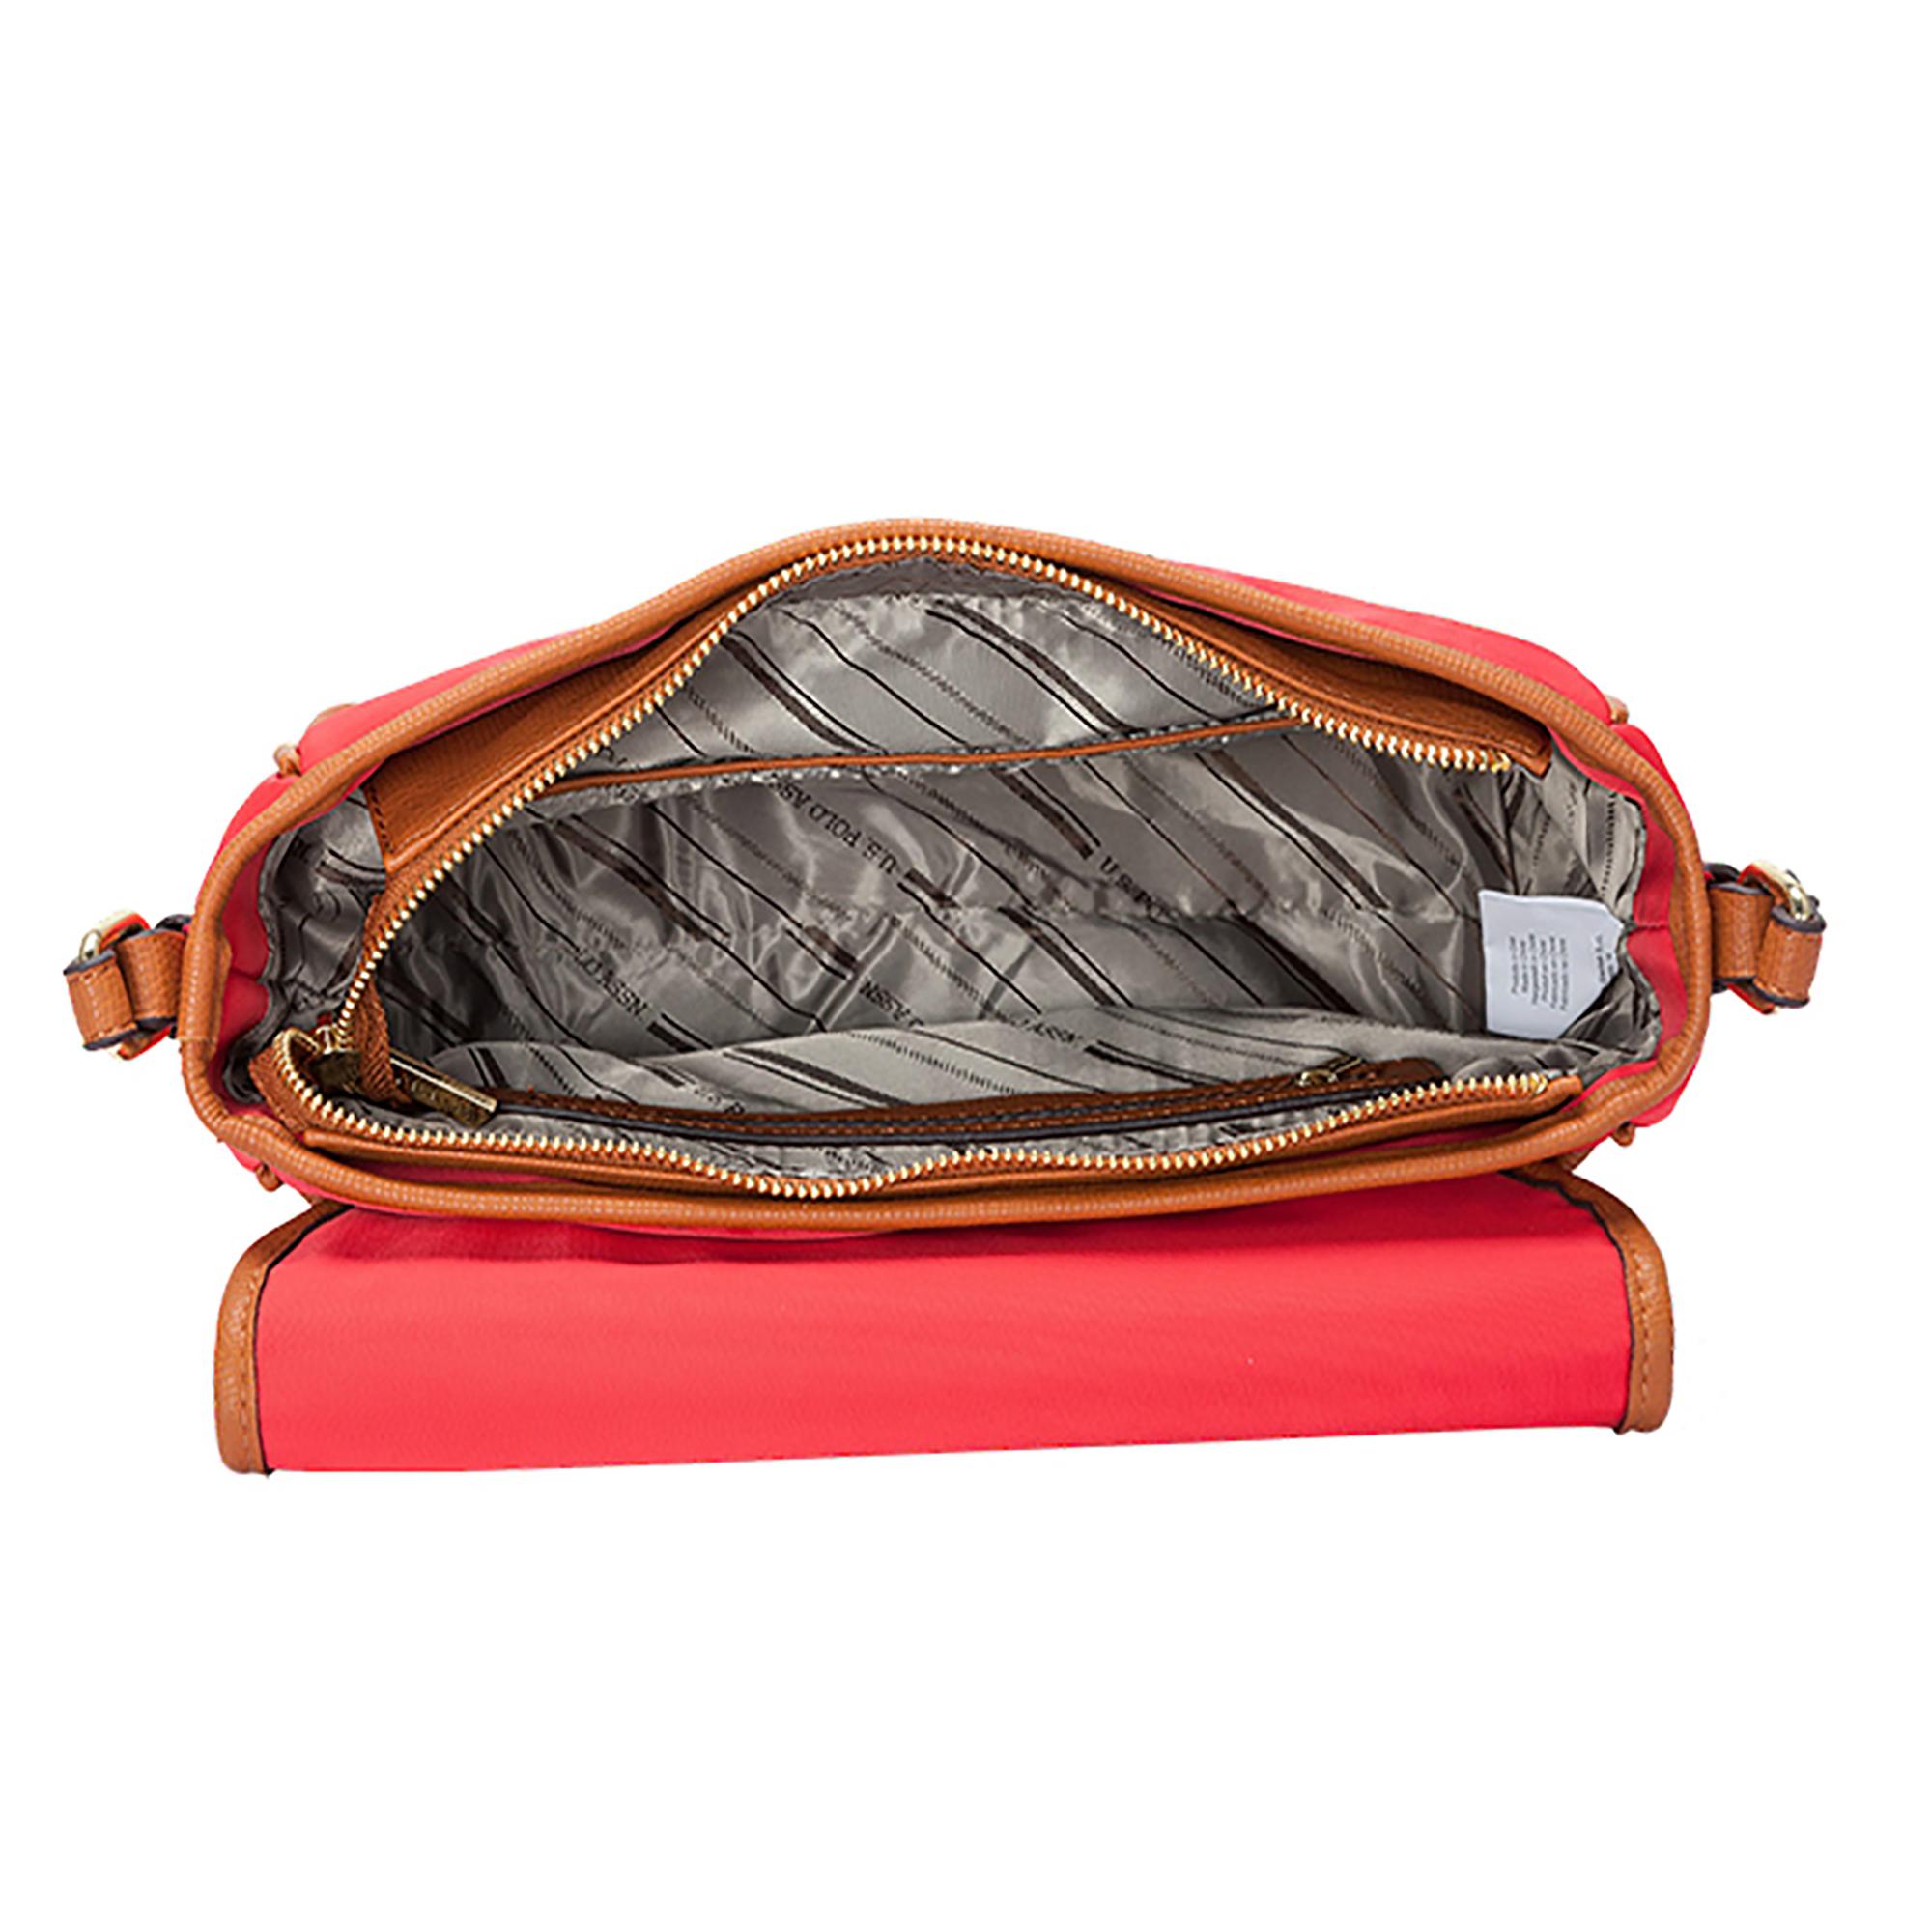 04f3846bb7 NEW US Polo Assn. Houston Womens Messenger Handbag Fashion Nylon ...